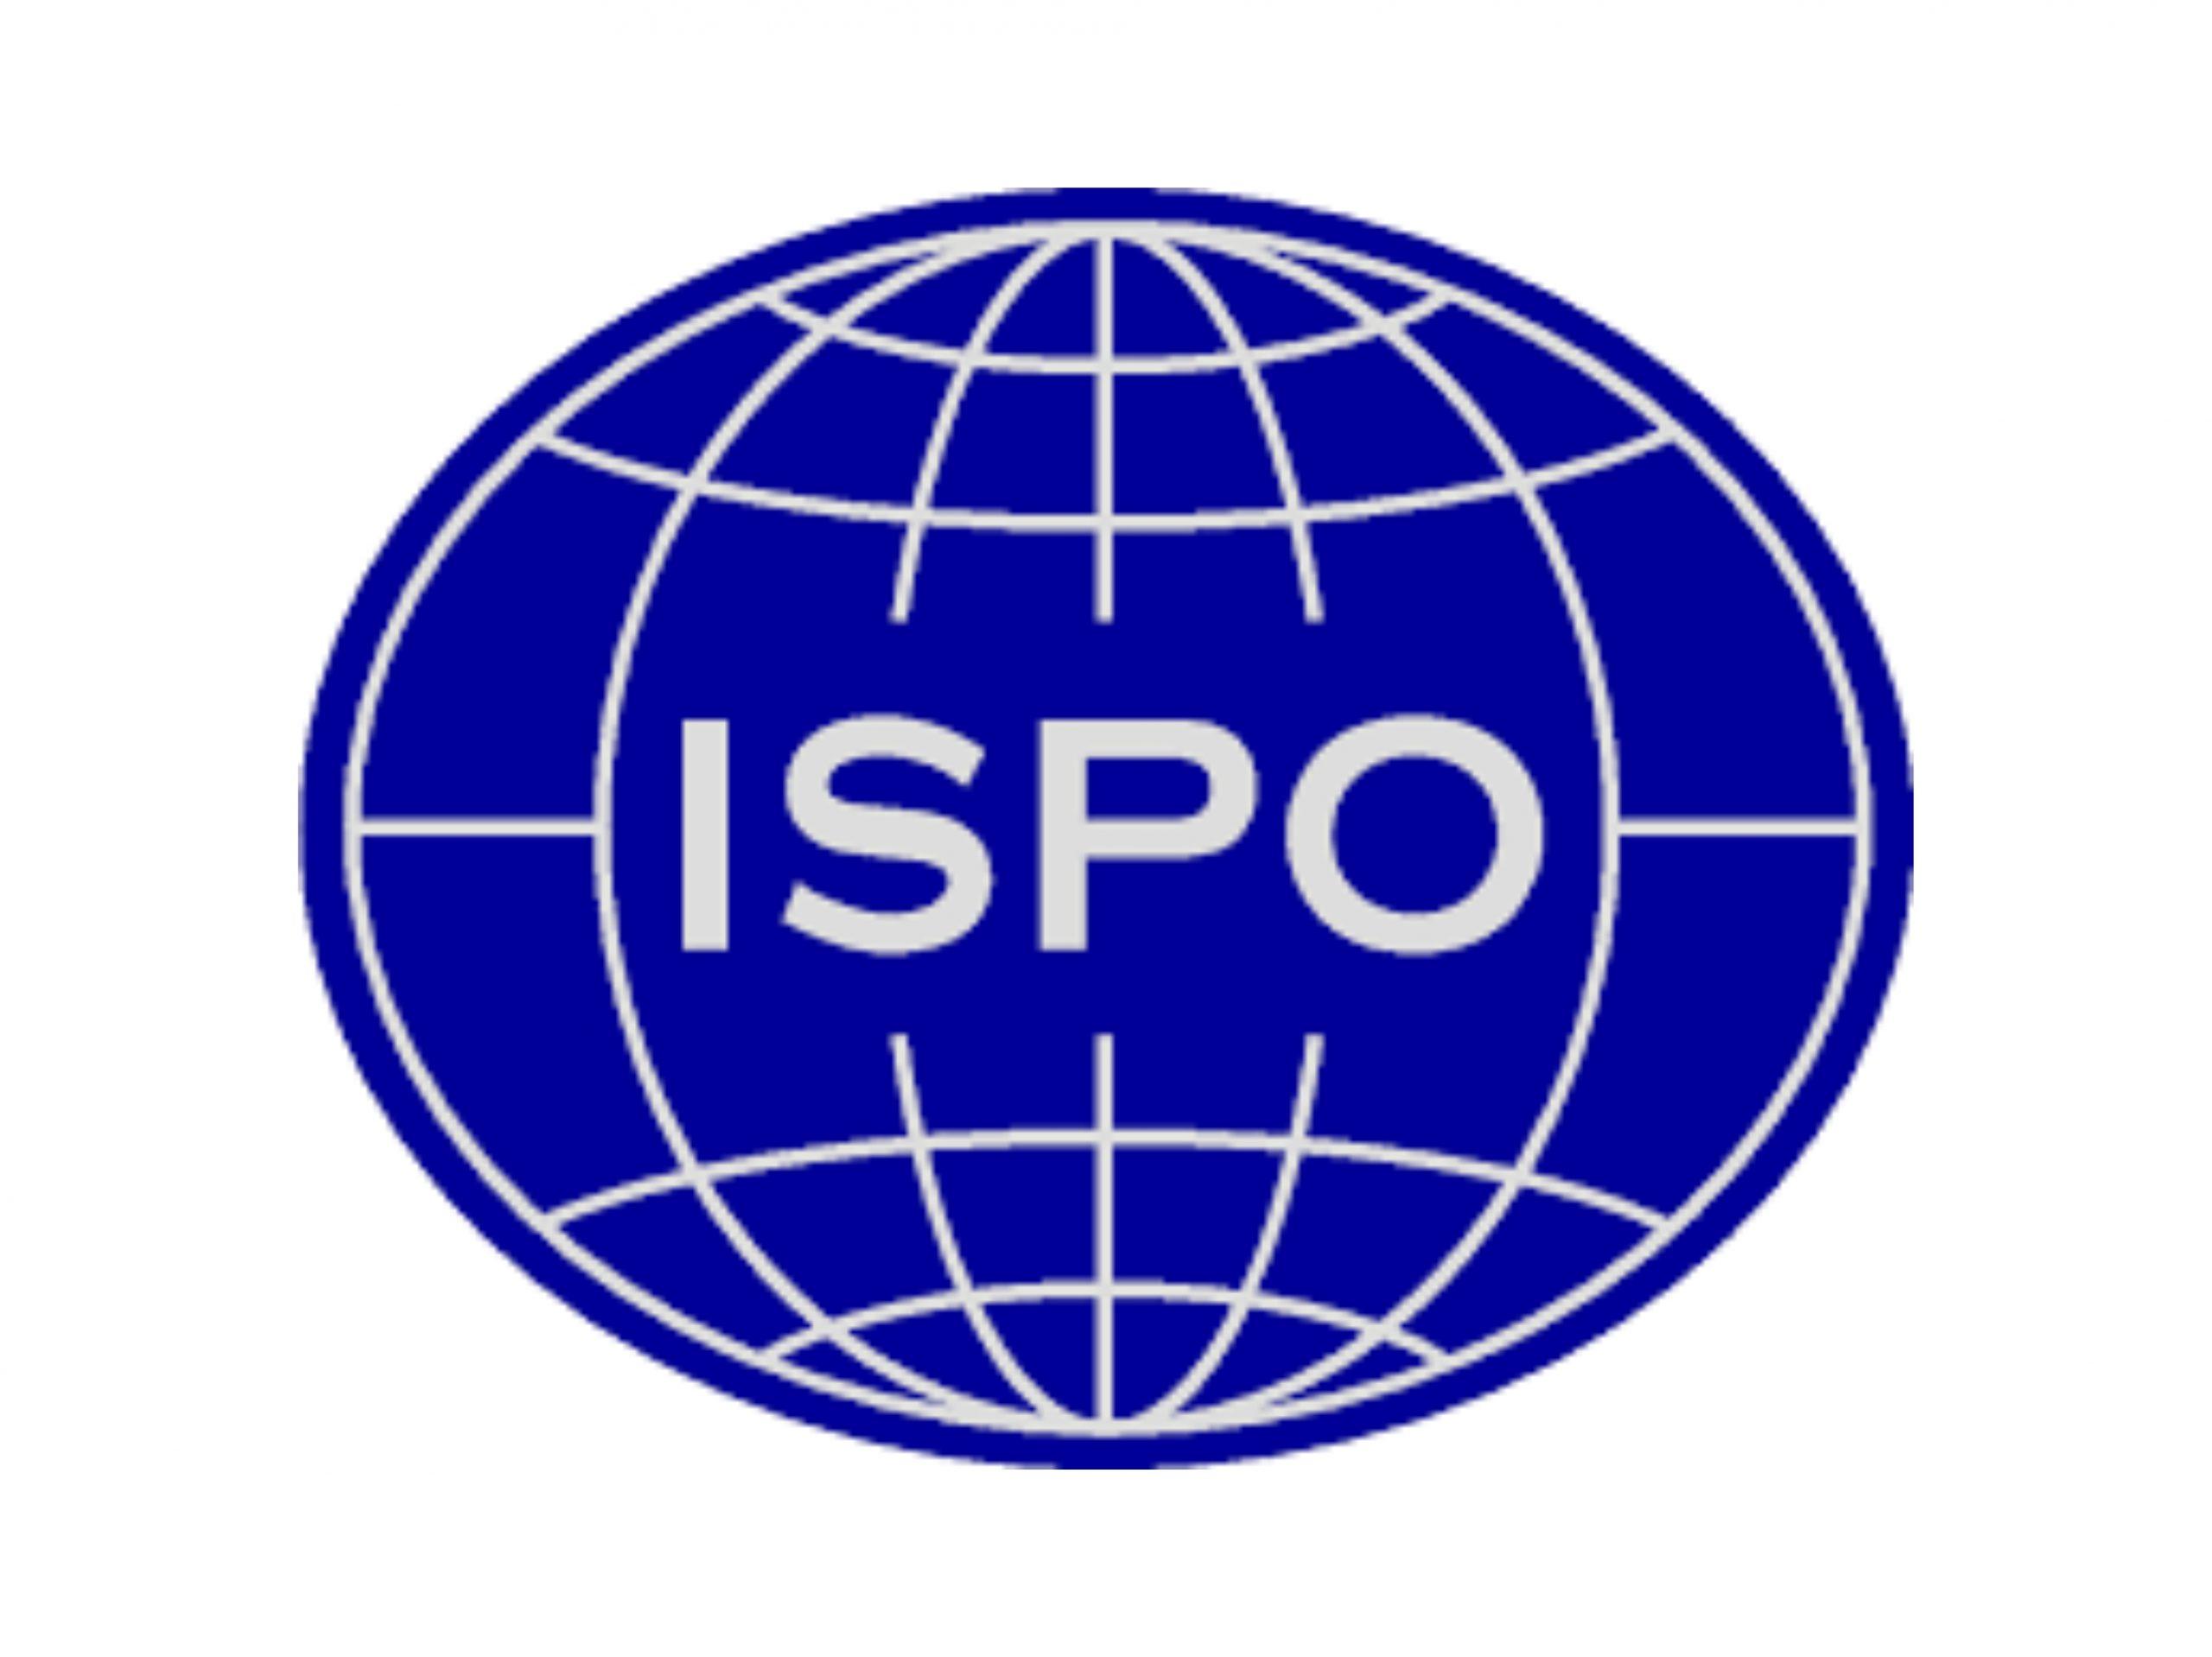 ISPO UK MS Webinar – Rebuilding Prosthetic & Orthotic Services Post Covid-19